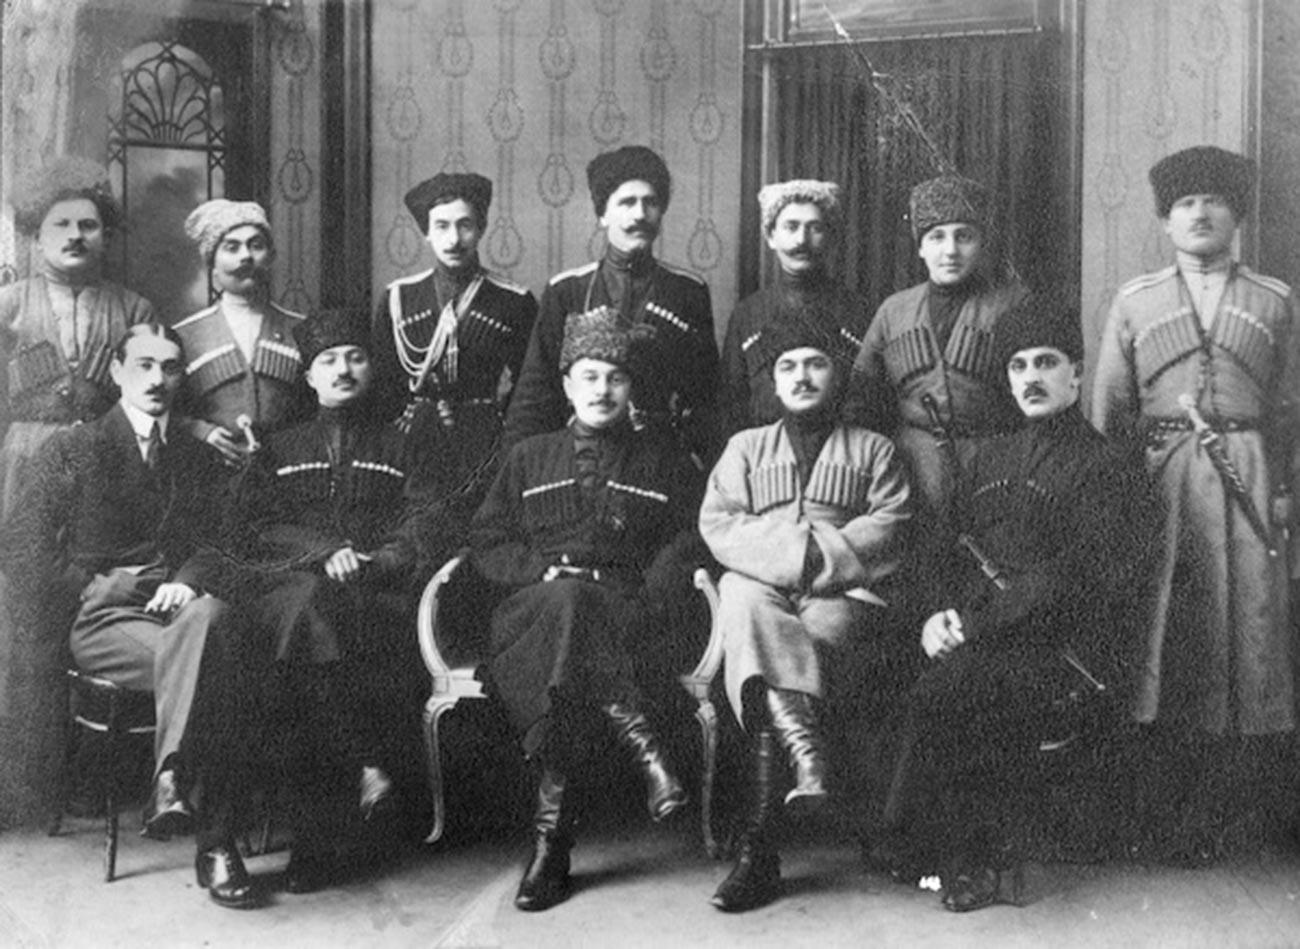 Anführer in der Gebirgsrepublik Nordkaukasus, 1917-1920